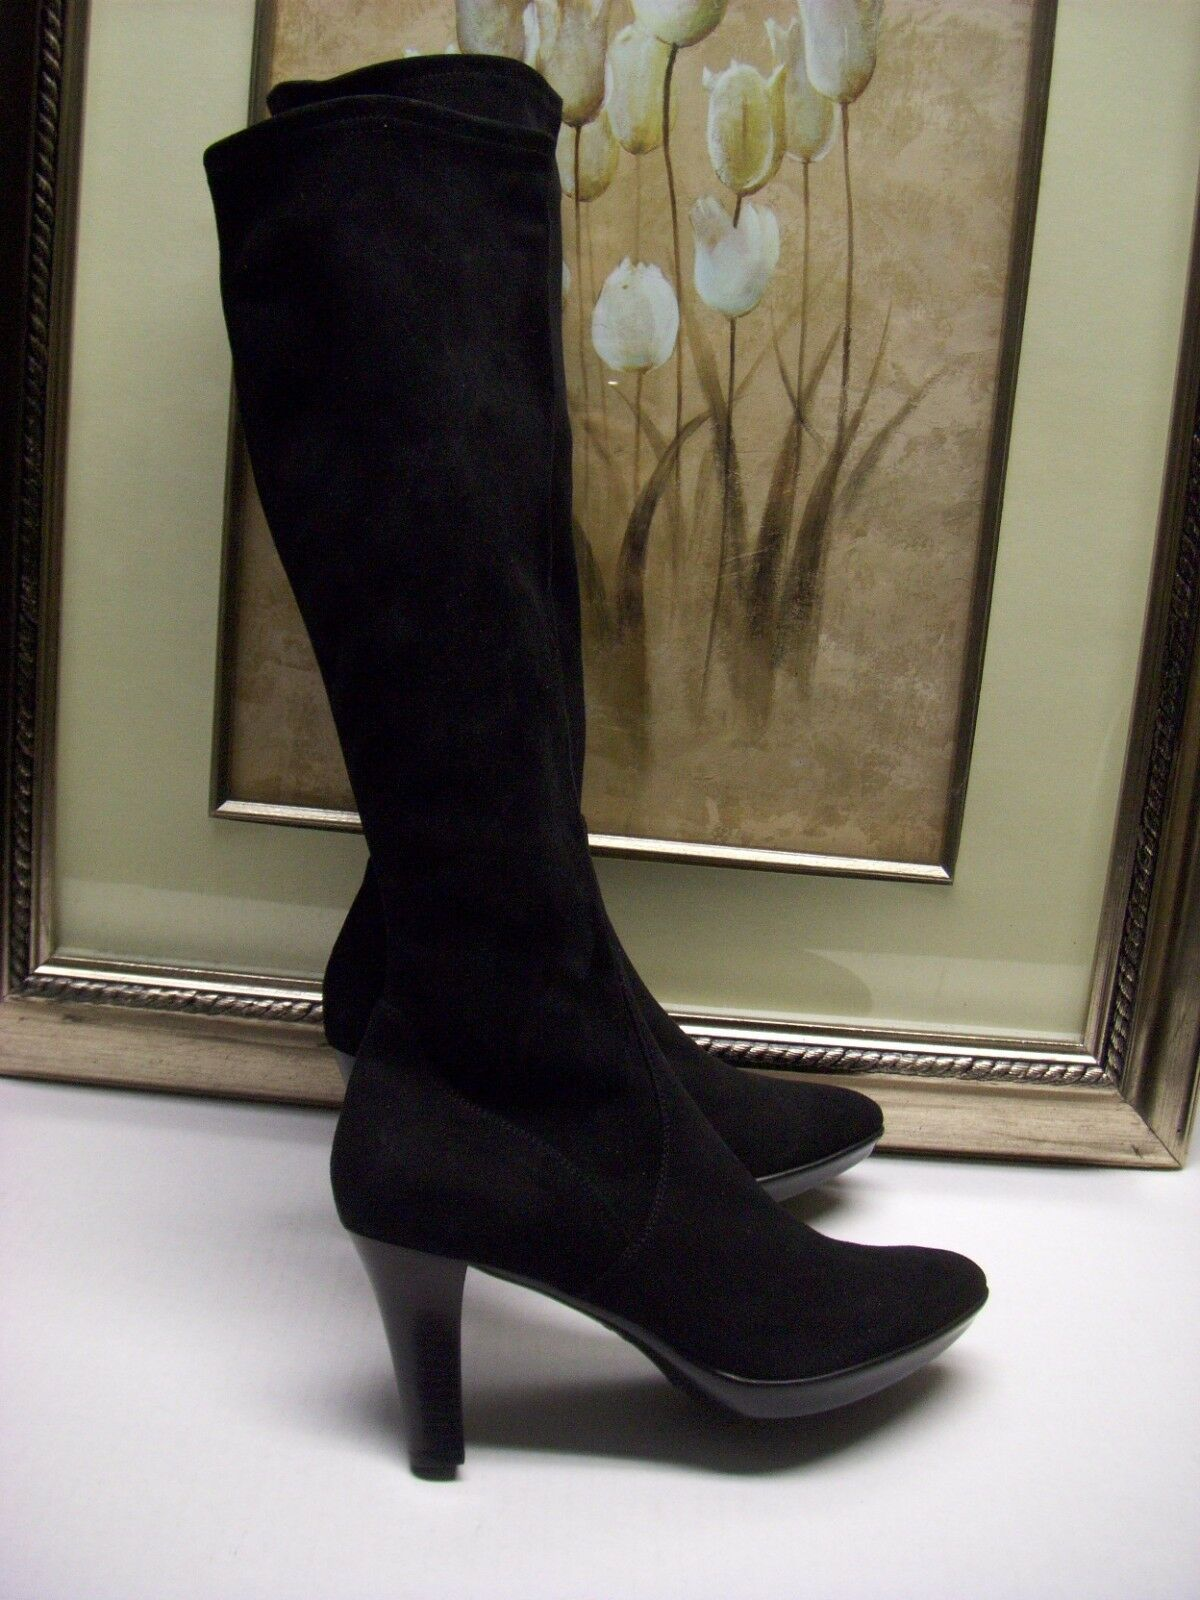 Aquatalia by Marvin K Rhumba Weatherproof SUEDE Boot Size 10 M $725 Black